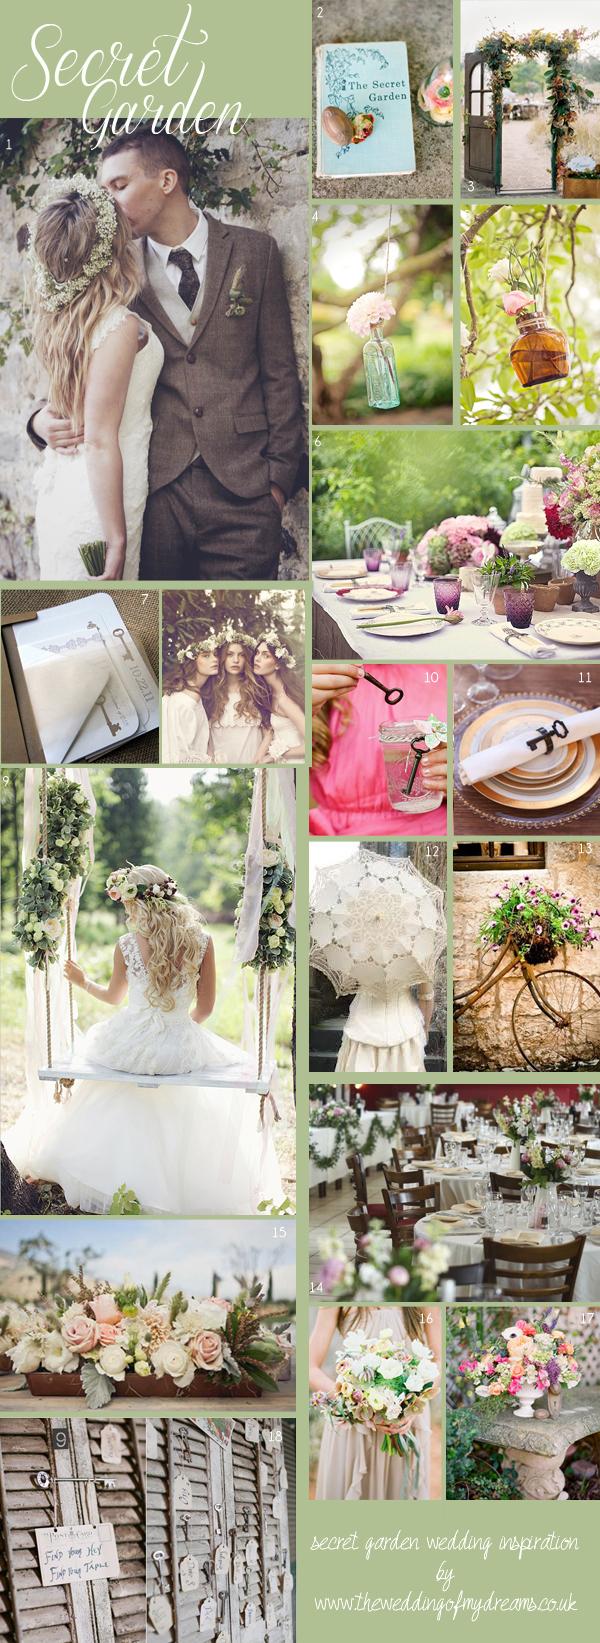 secret garden wedding decoration inspiration